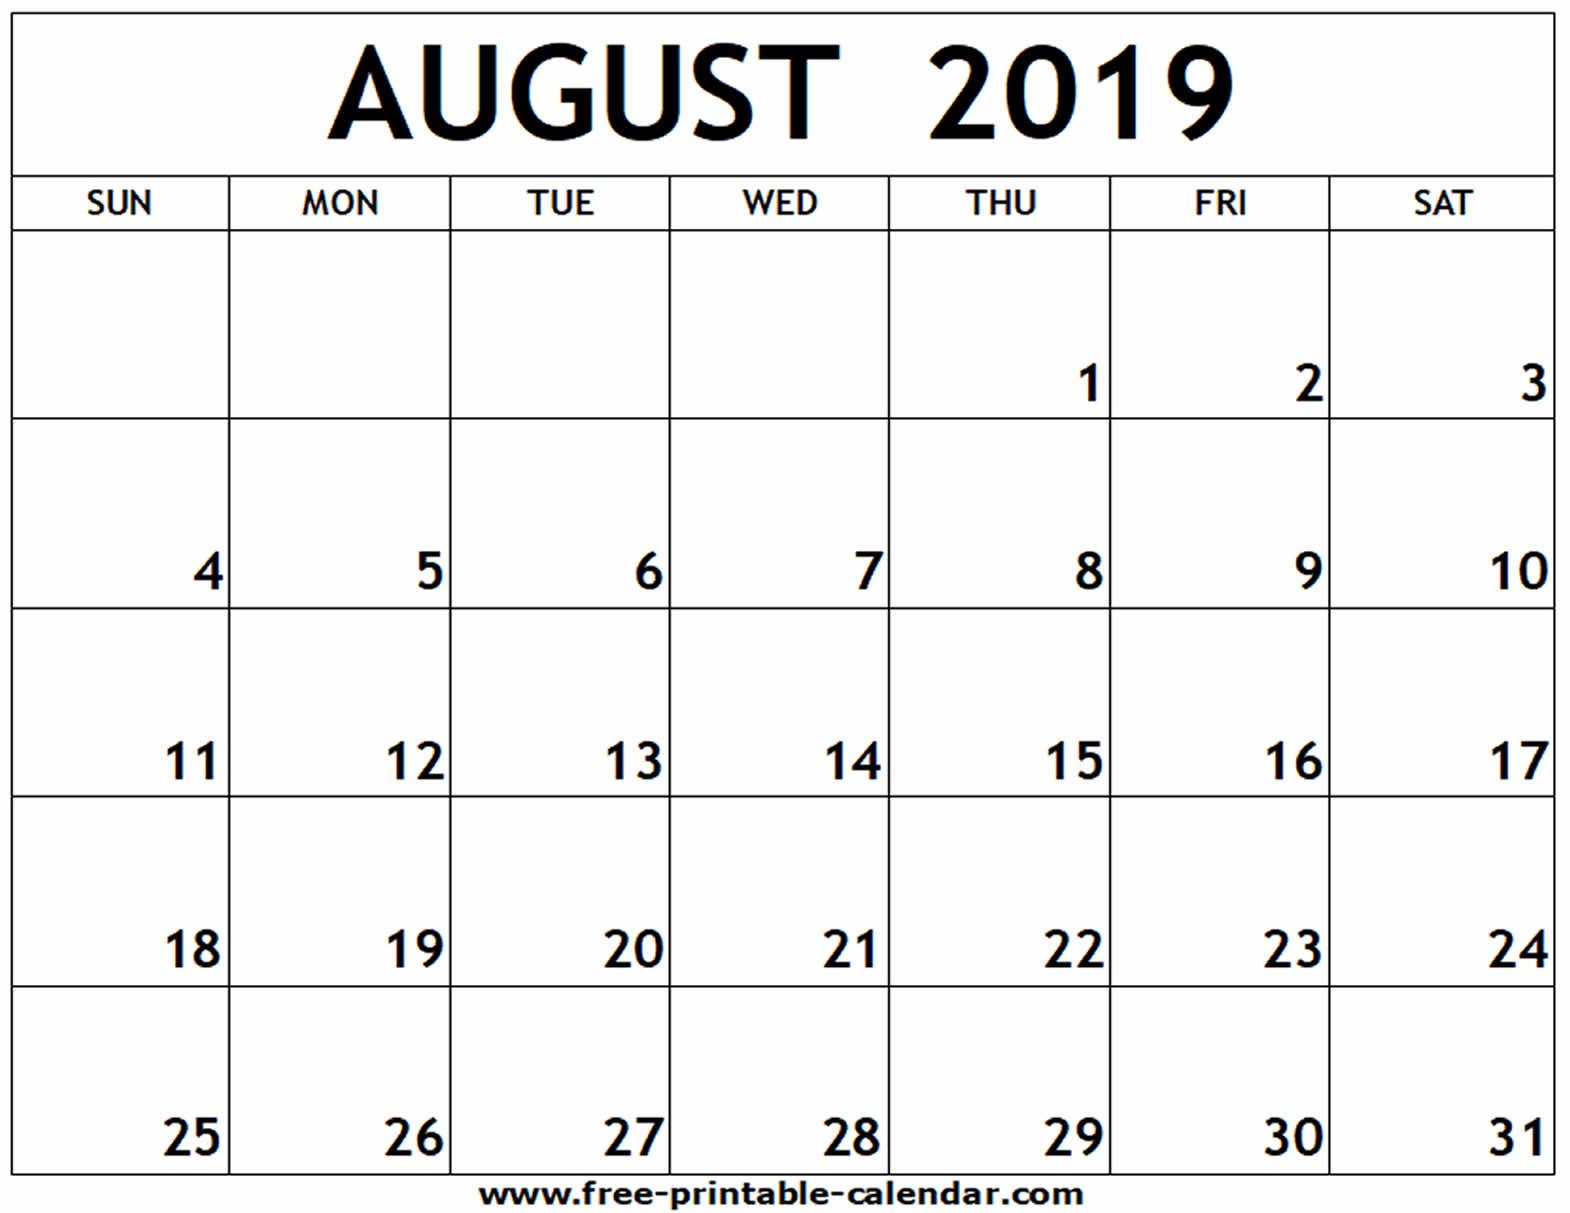 August 2019 Printable Calendar - Free-Printable-Calendar with Blank Printable Calendar August